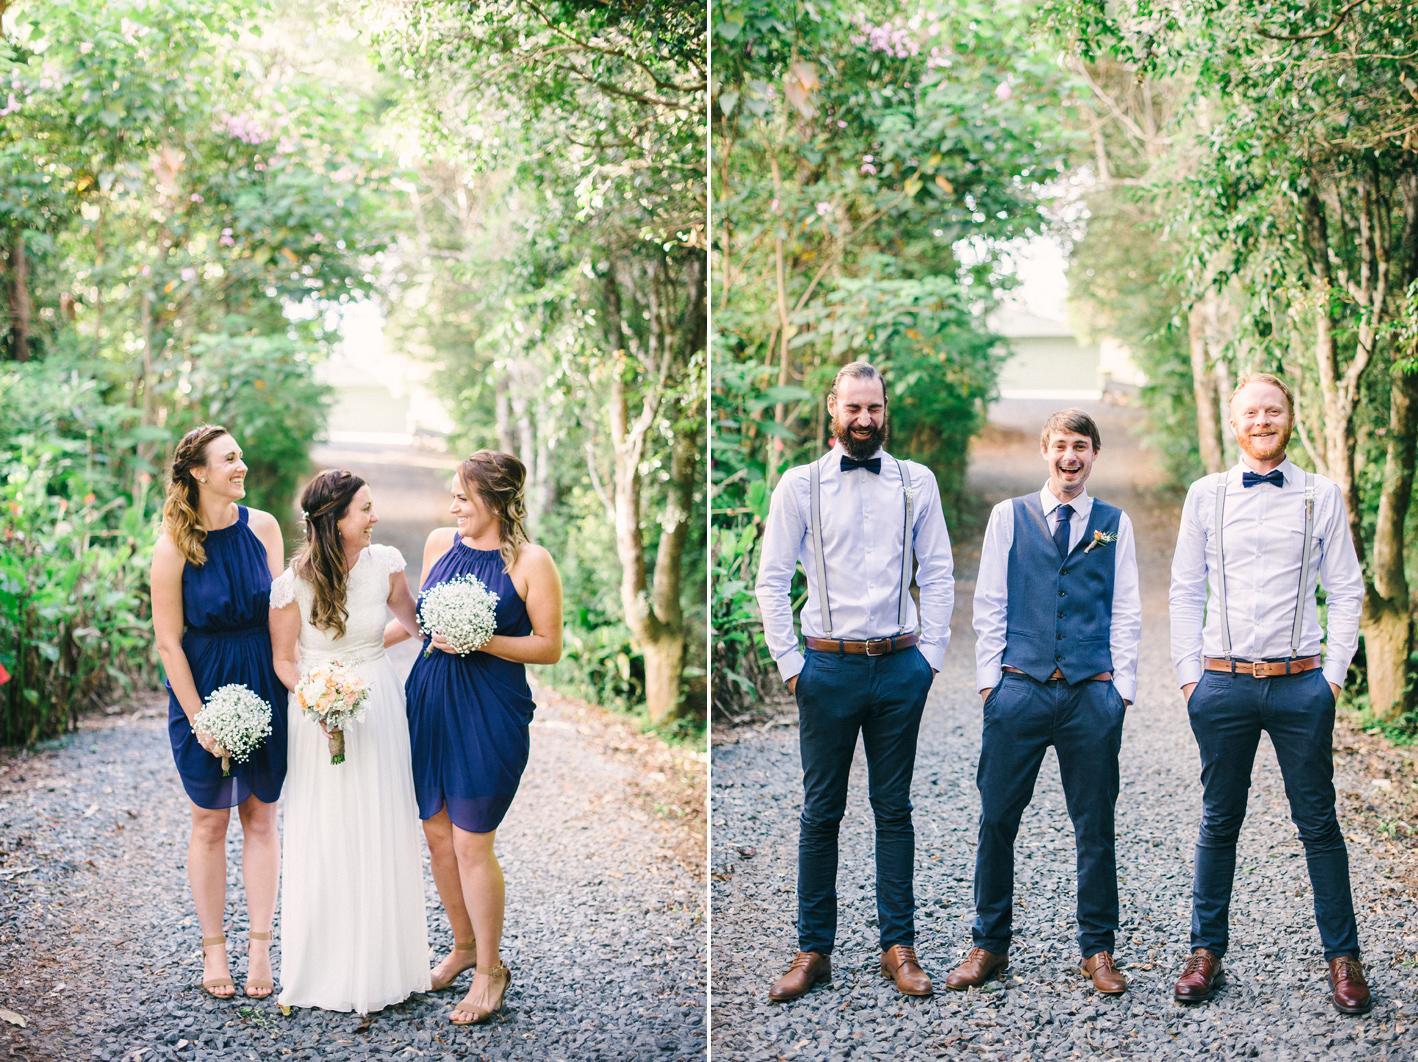 040-michelle-reagan-mount-tamborine-wedding-sophie-baker-photography